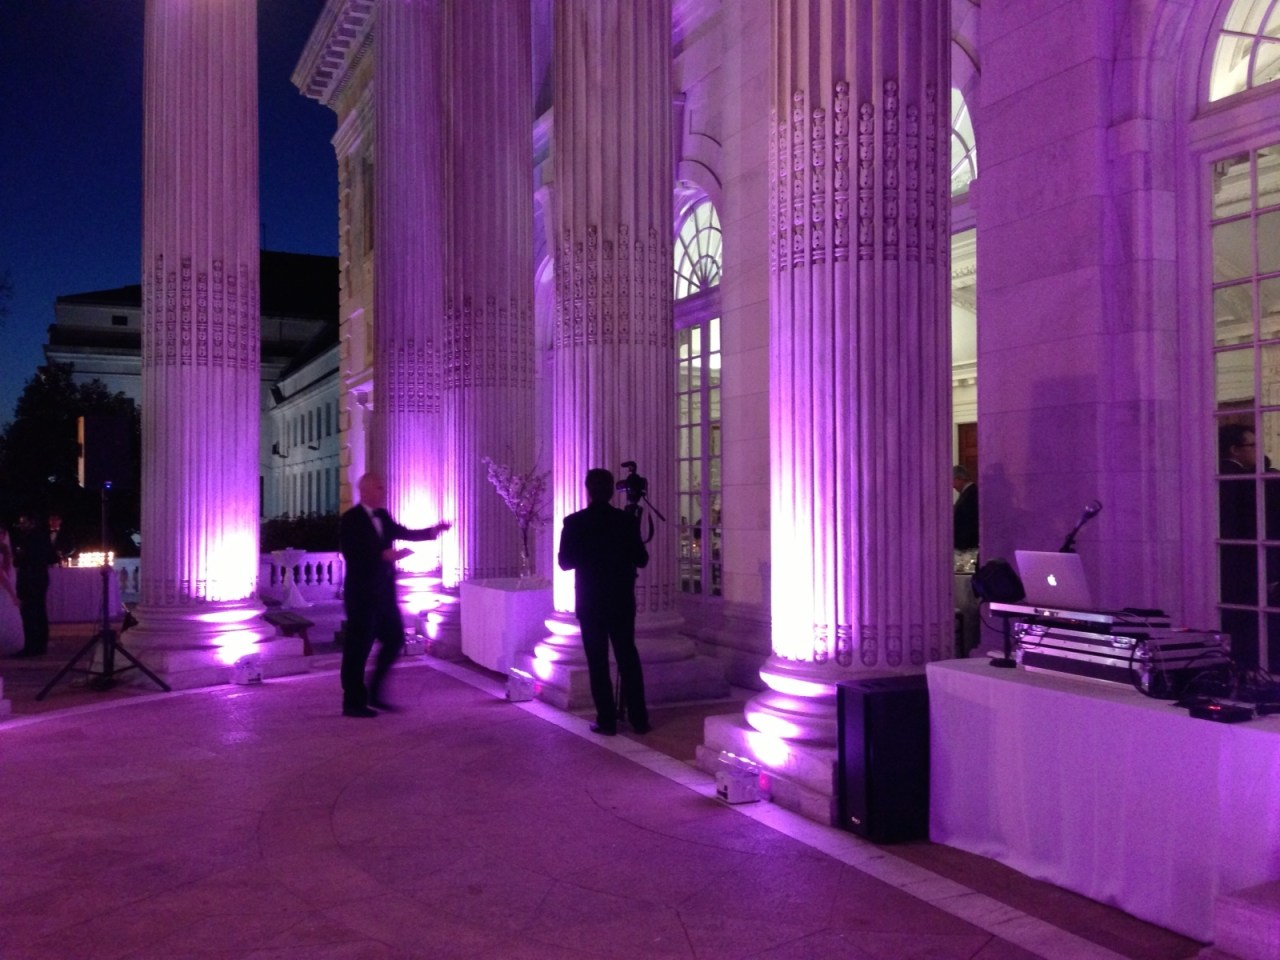 Our uplighting at Elizabeth & Mark's wedding at DAR HQ